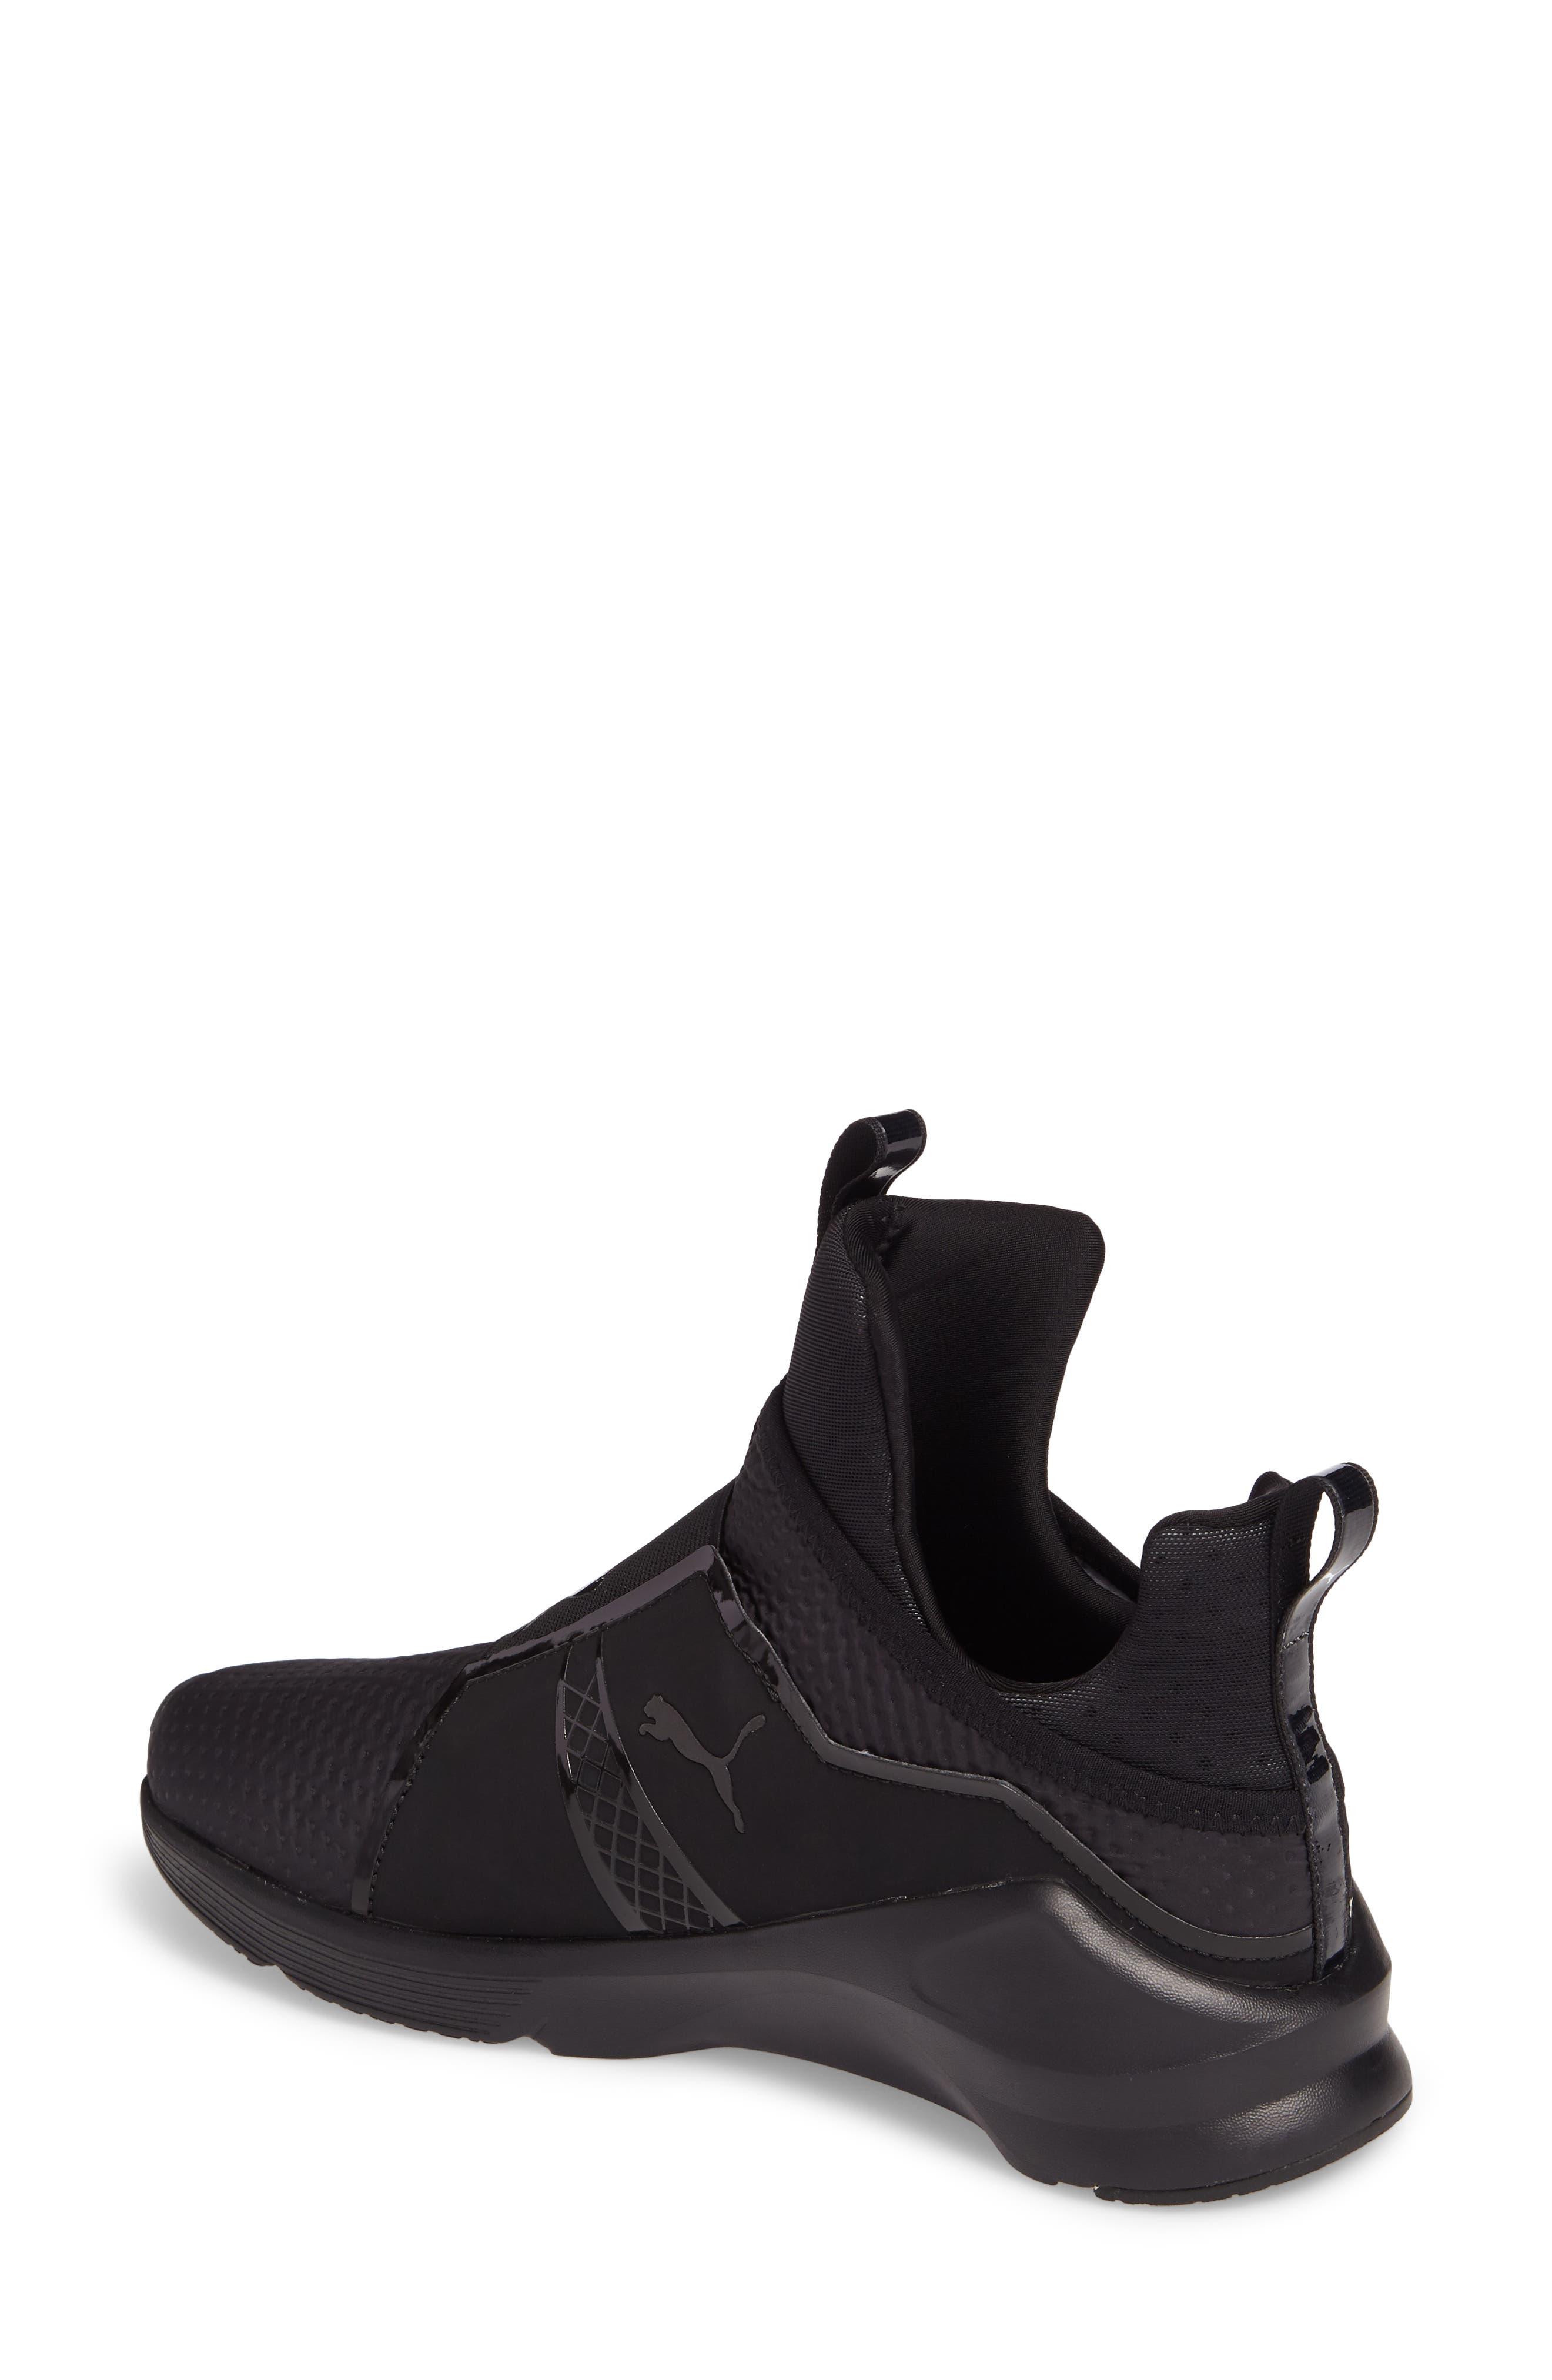 Alternate Image 2  - PUMA 'Fierce Core' High Top Sneaker (Women)